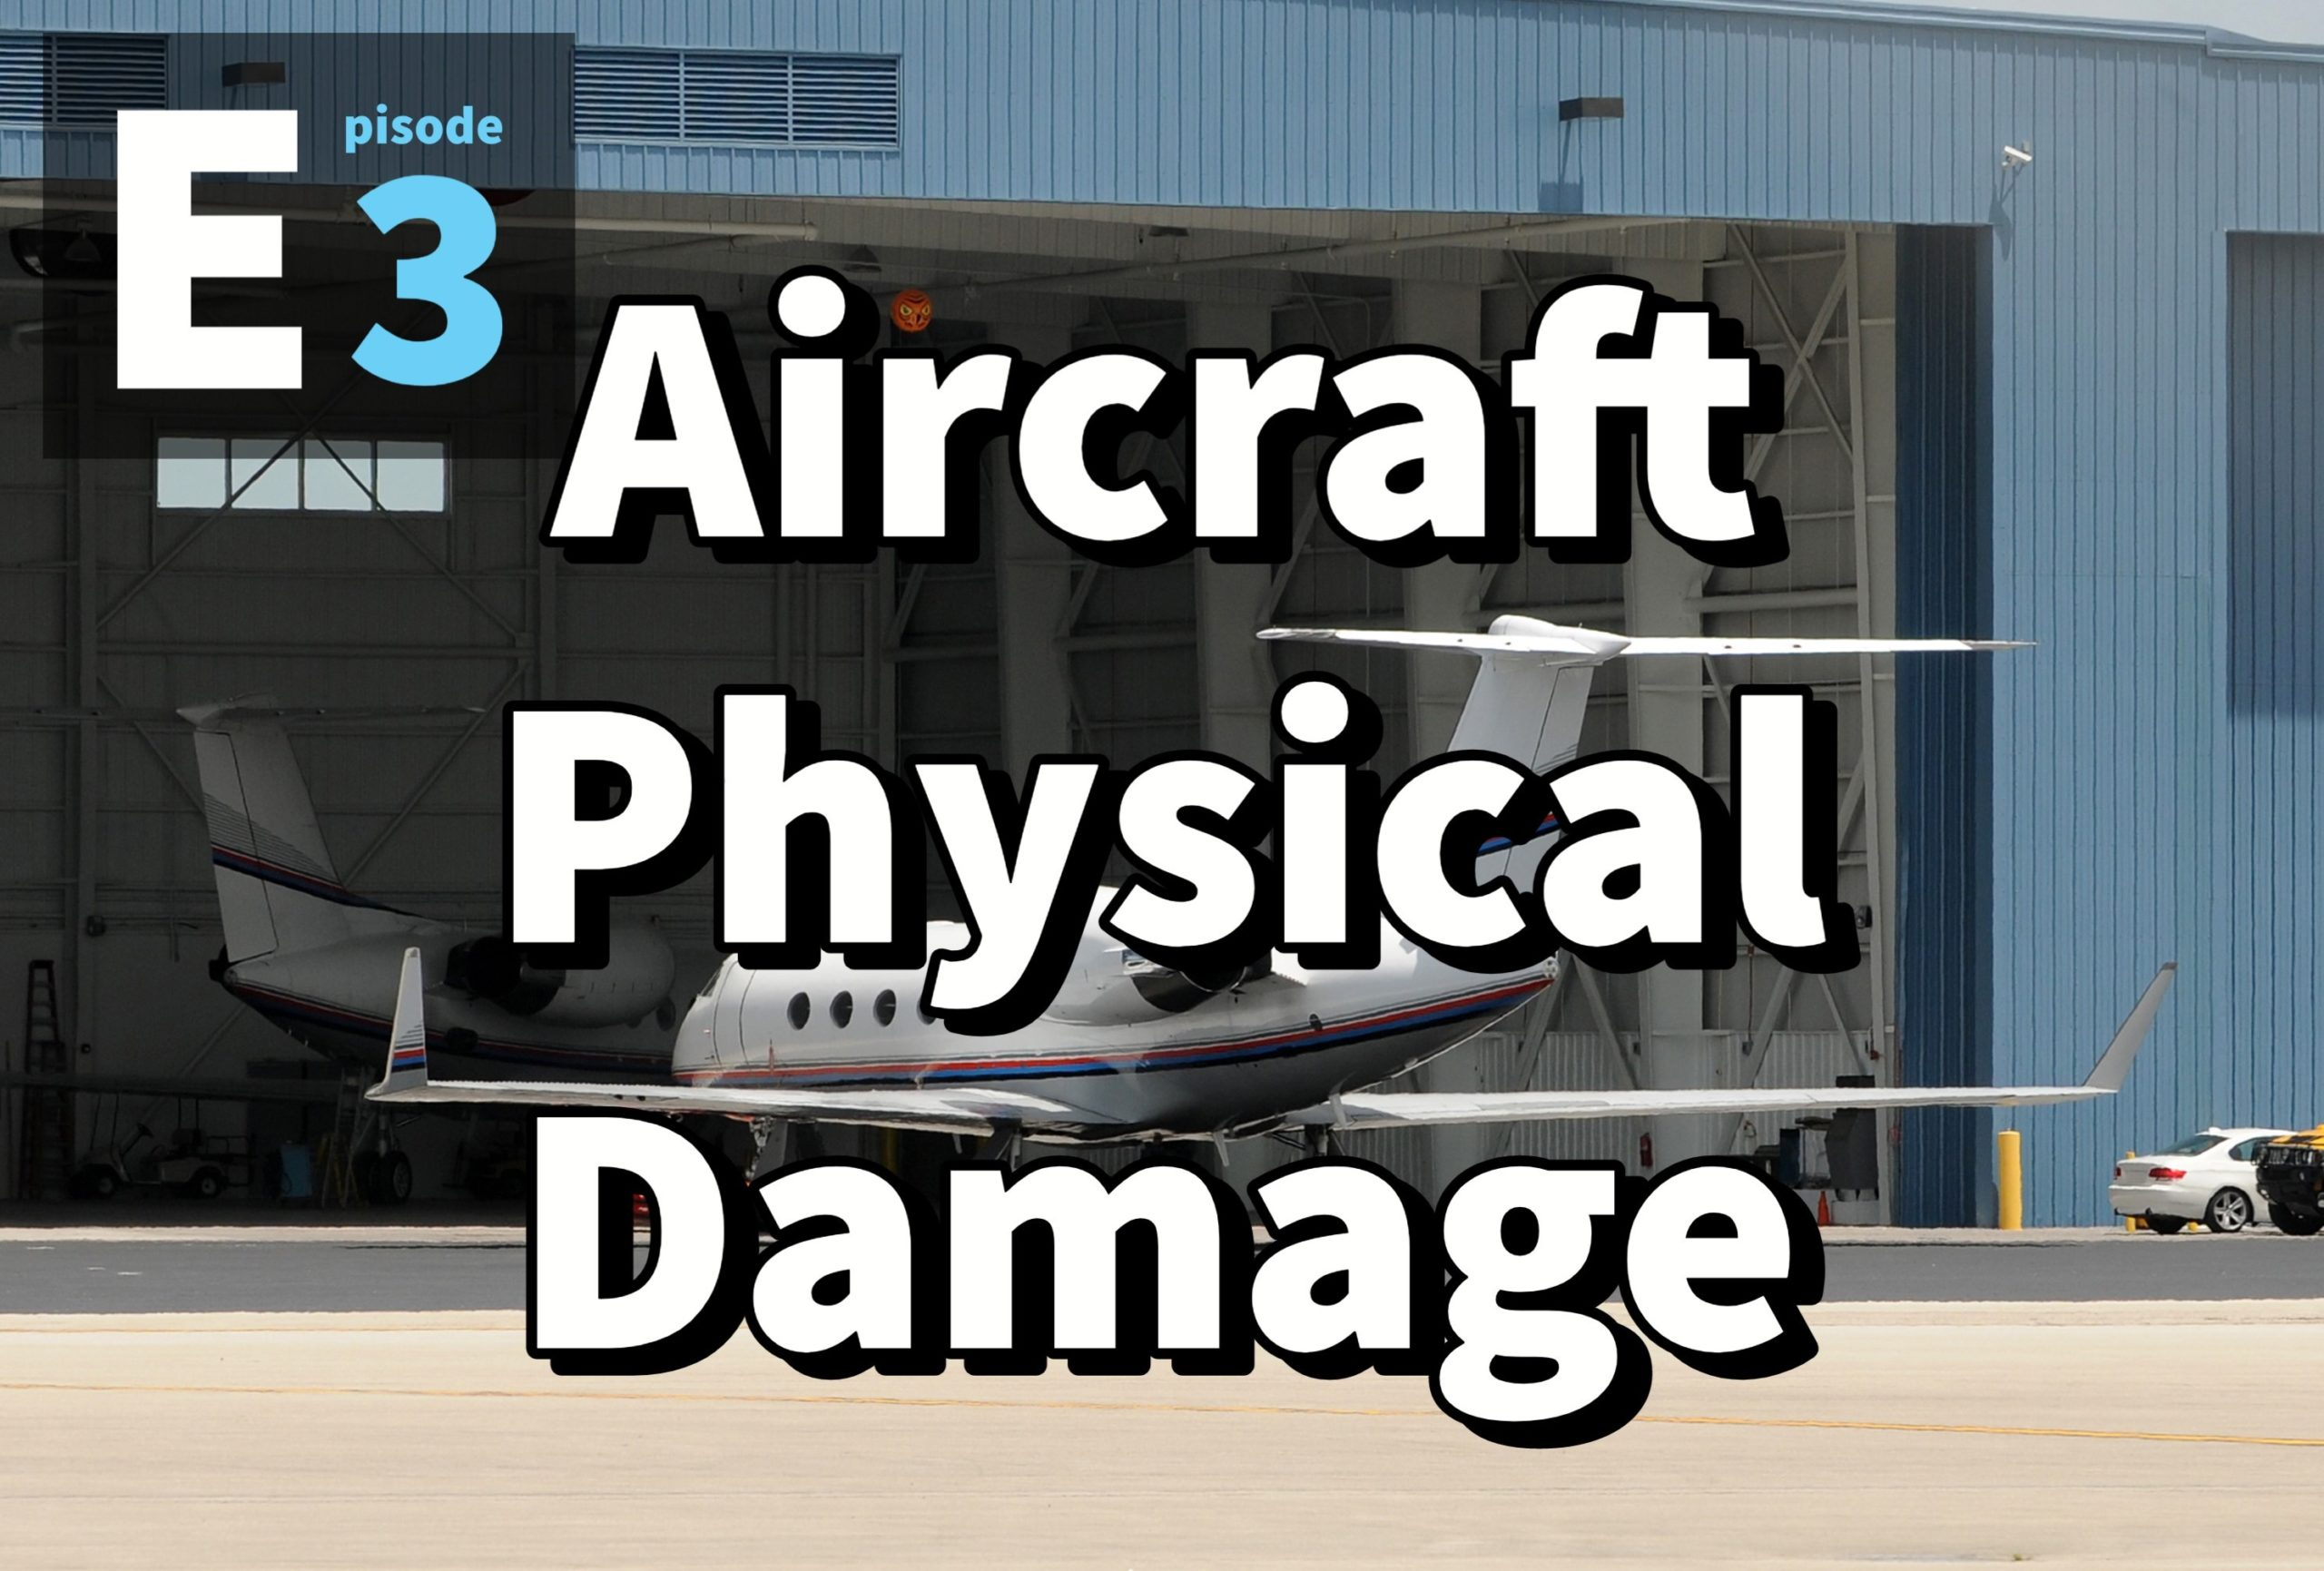 Aircraft Physical Damage